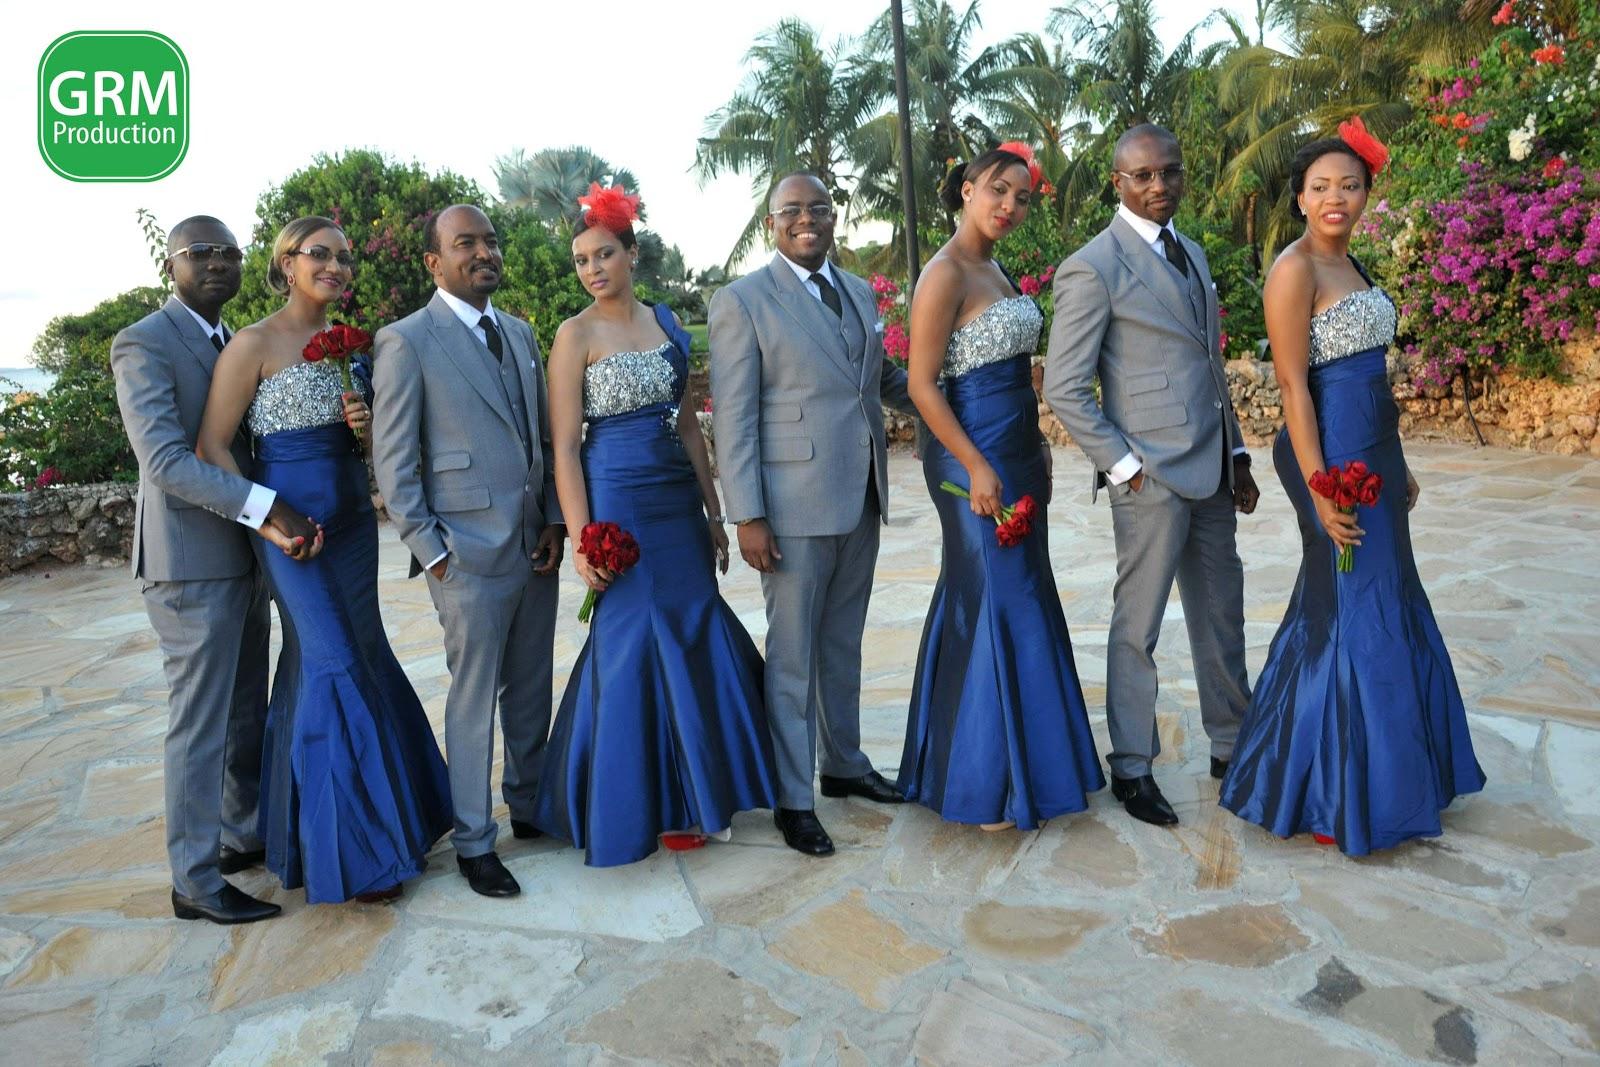 Royal Blue And Red Wedding Decorations: Decor blue wedding ...